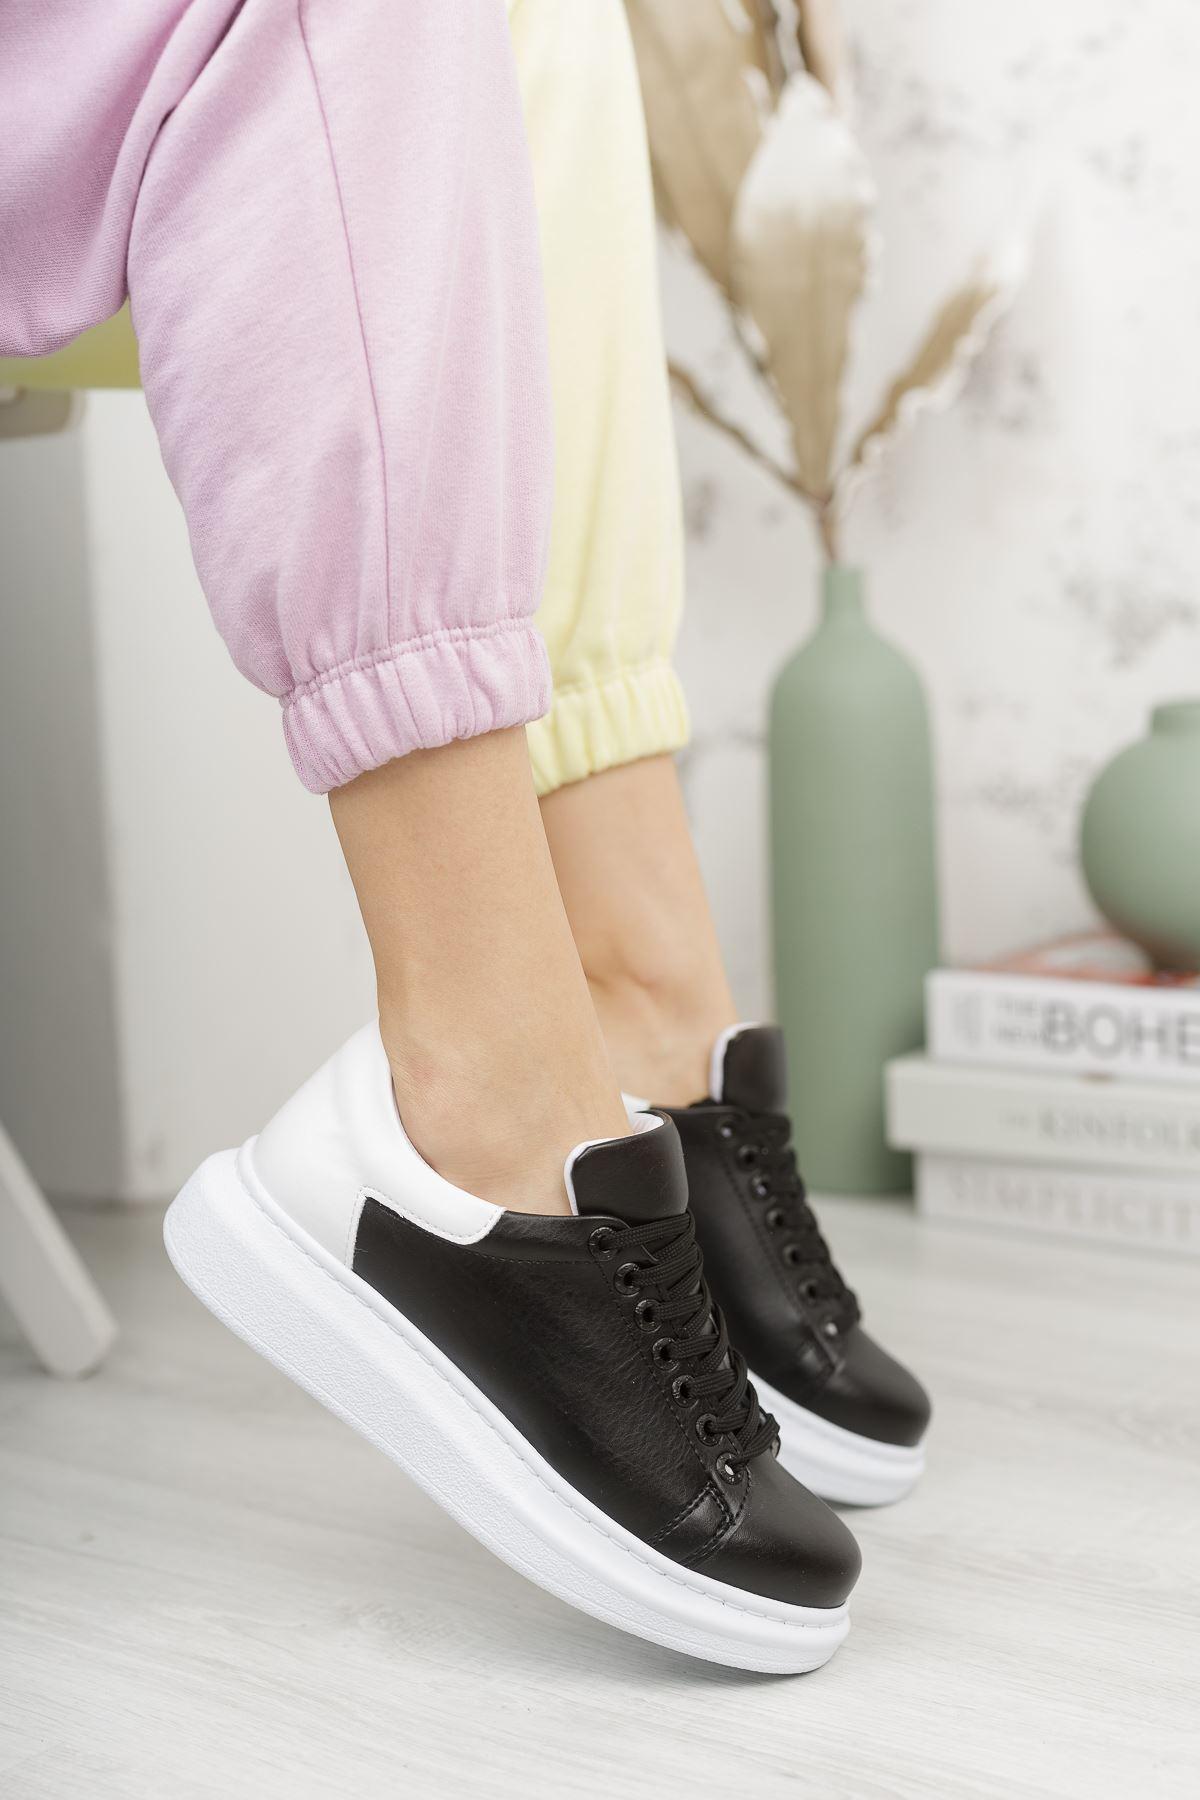 Chekich CH256 BT Kadın Ayakkabı SİYAH/BEYAZ